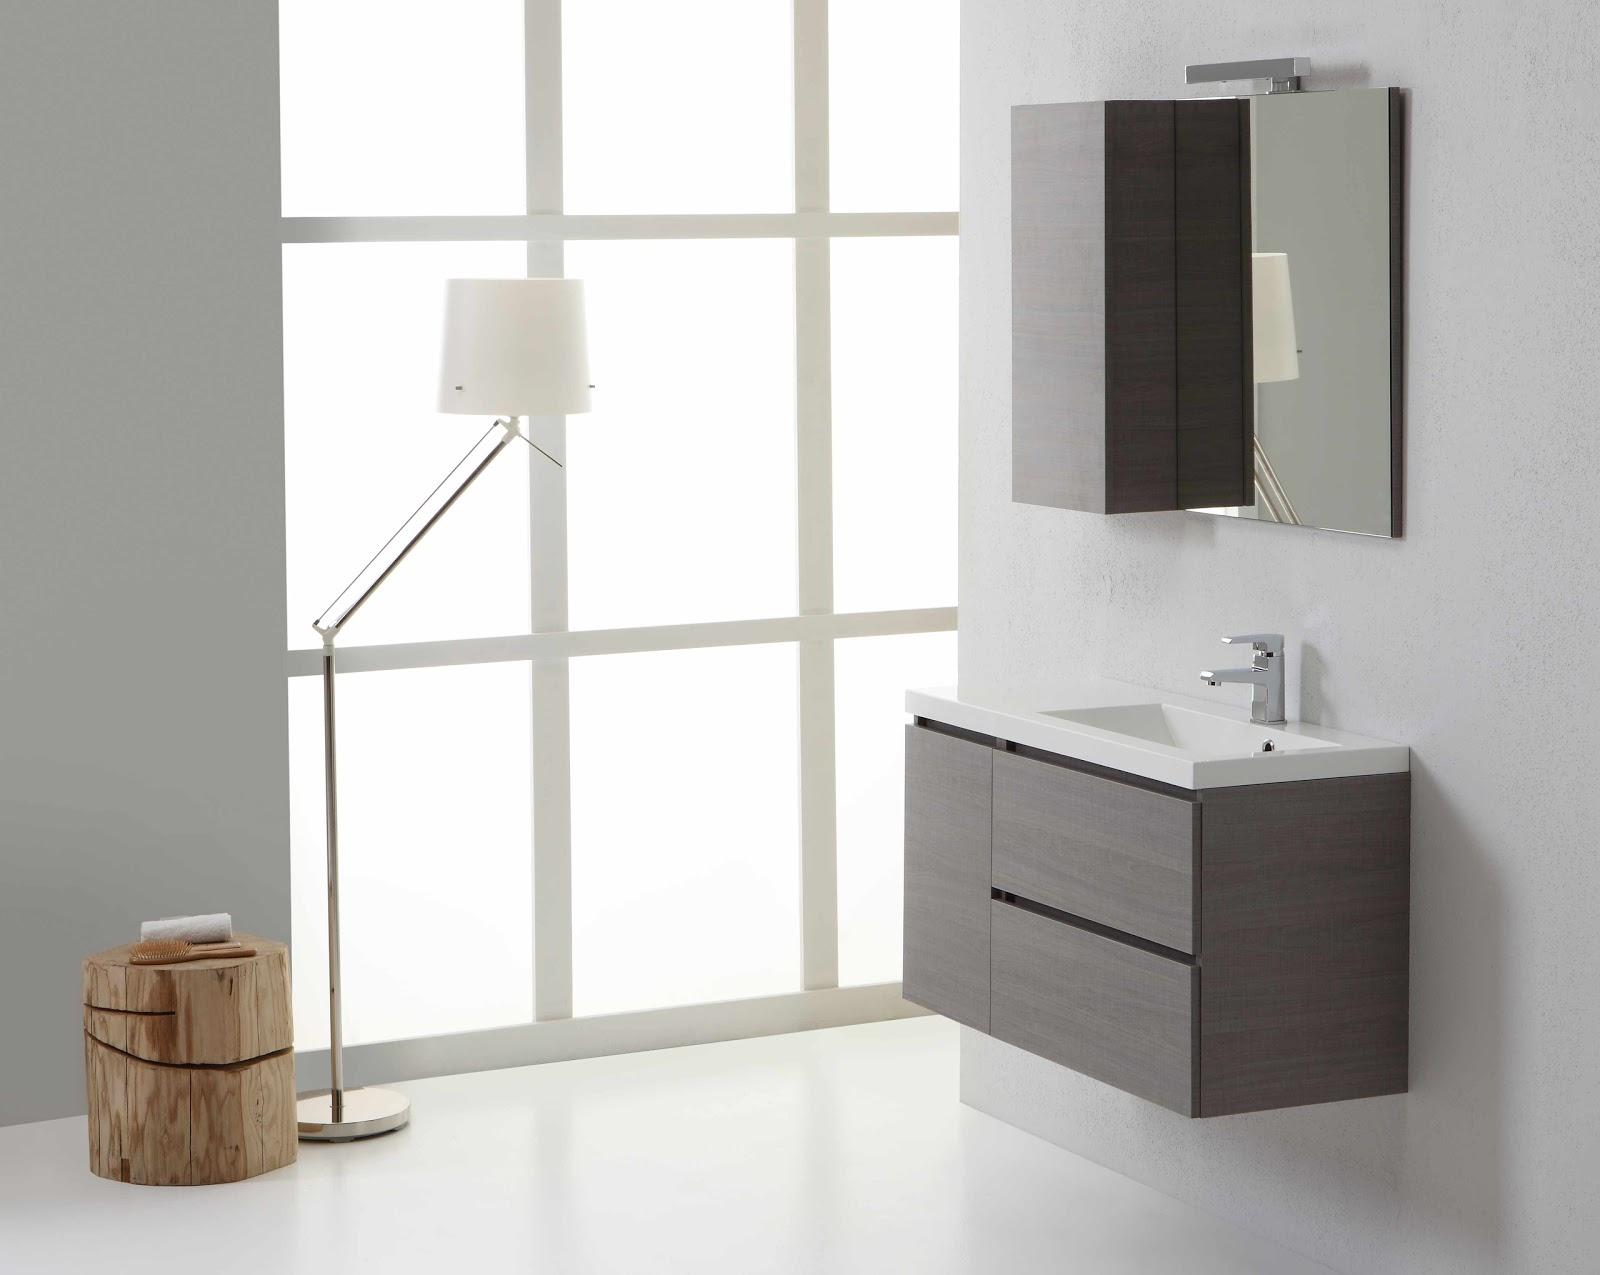 Corriere del web mobili bagno moderni kv store - Bagni moderni ikea ...